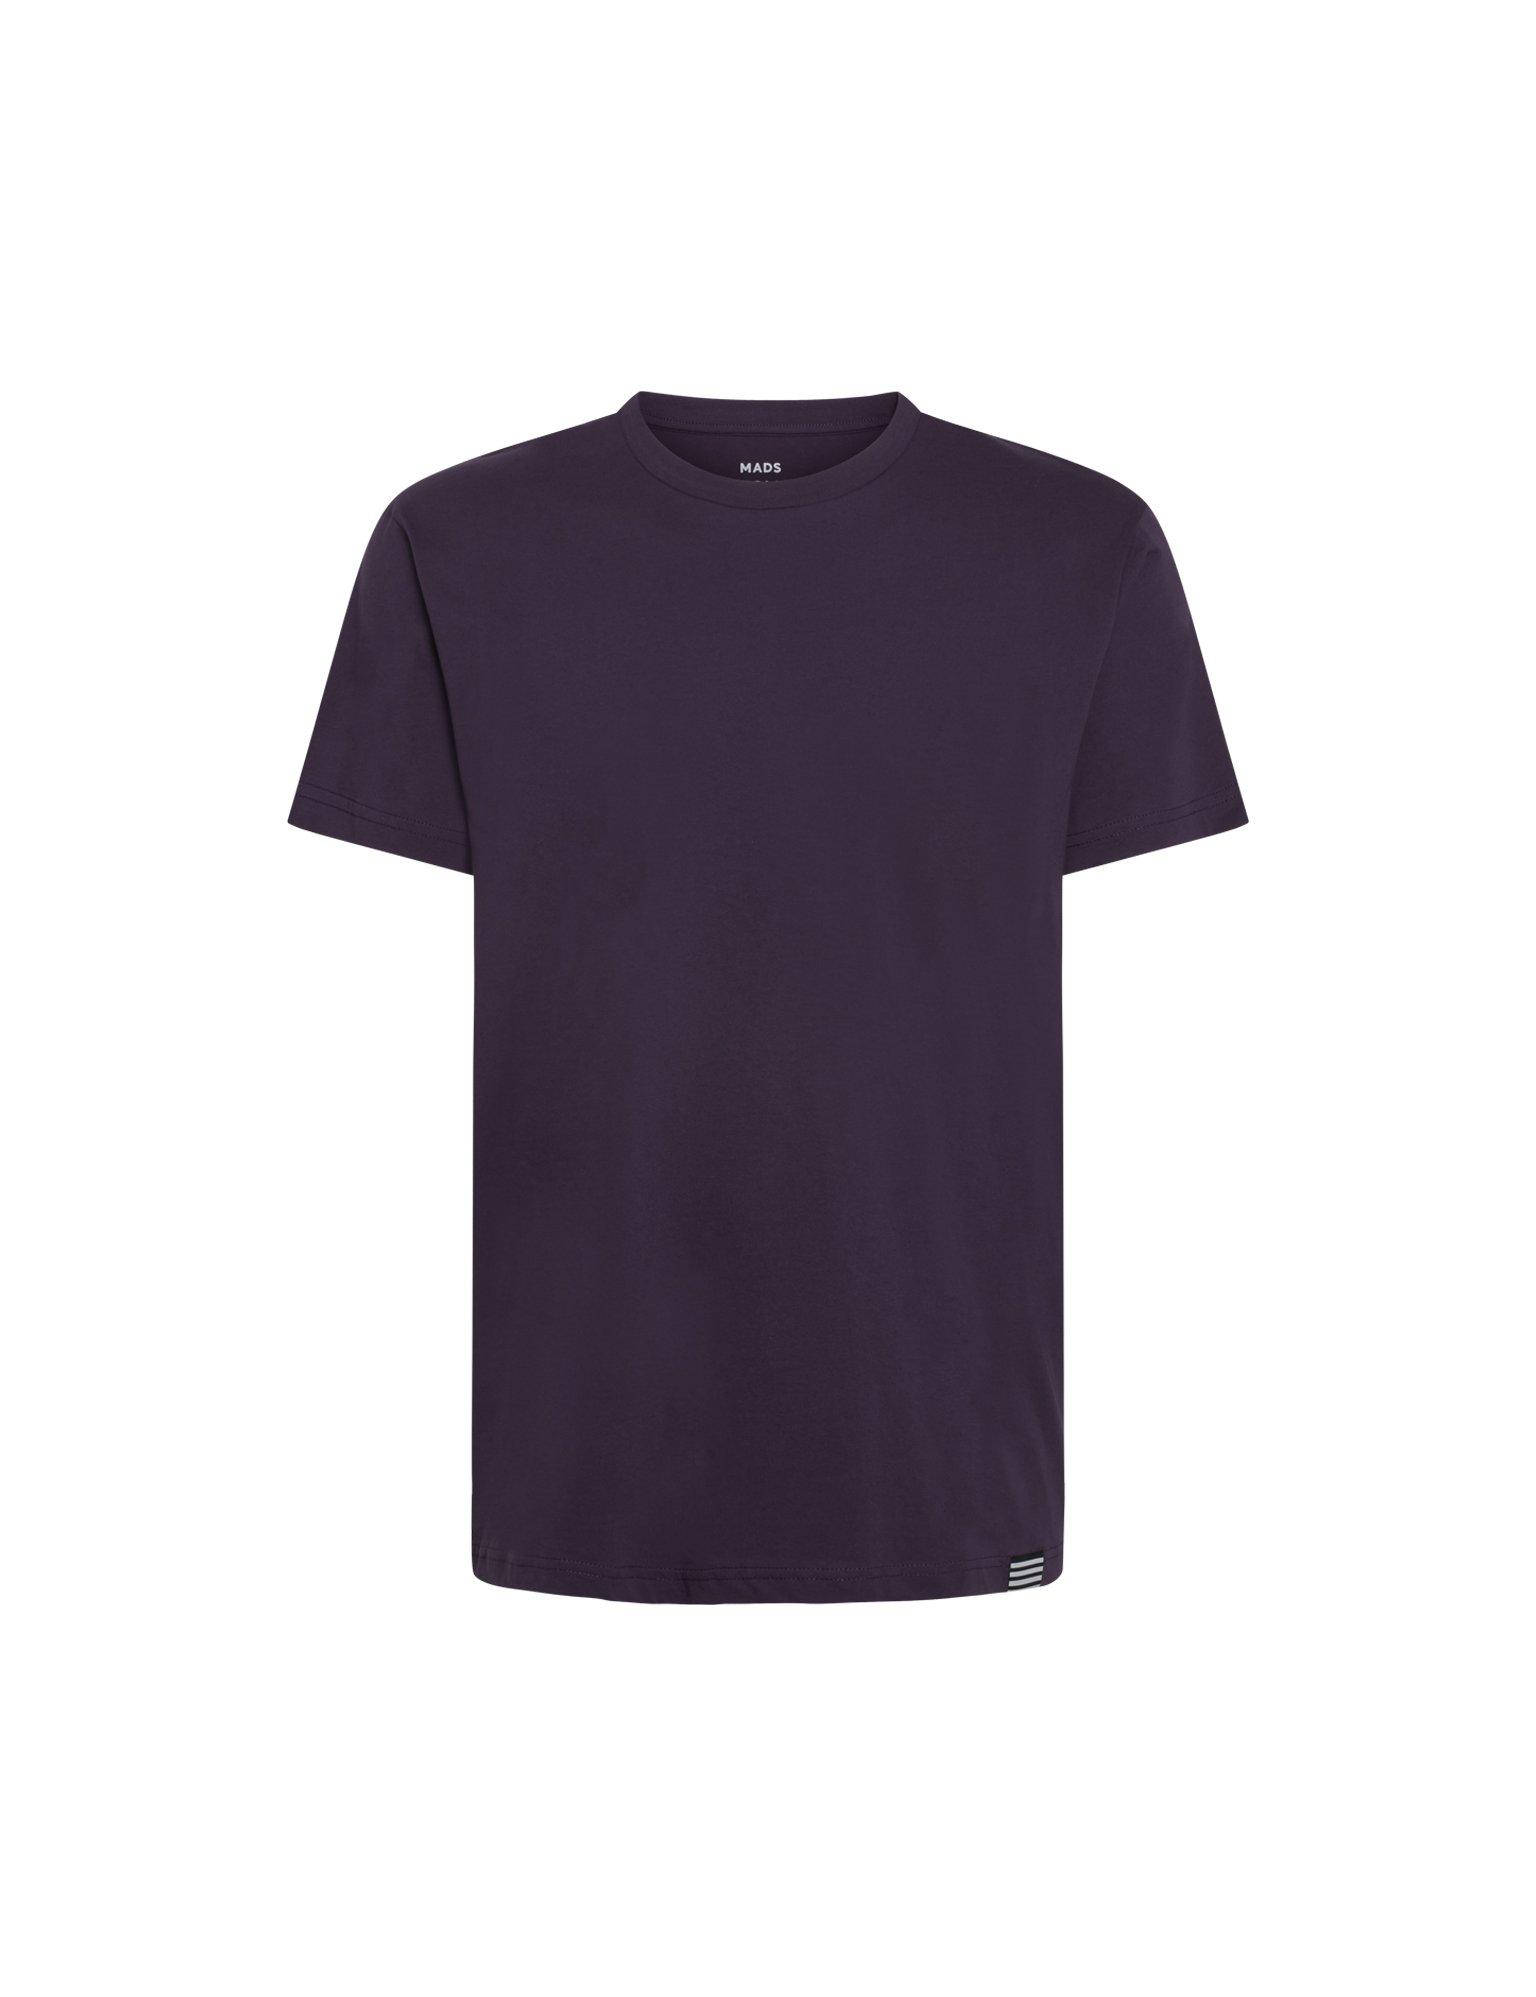 Mads Nørgaard Favorite Thor t-shirt, nightshade, large